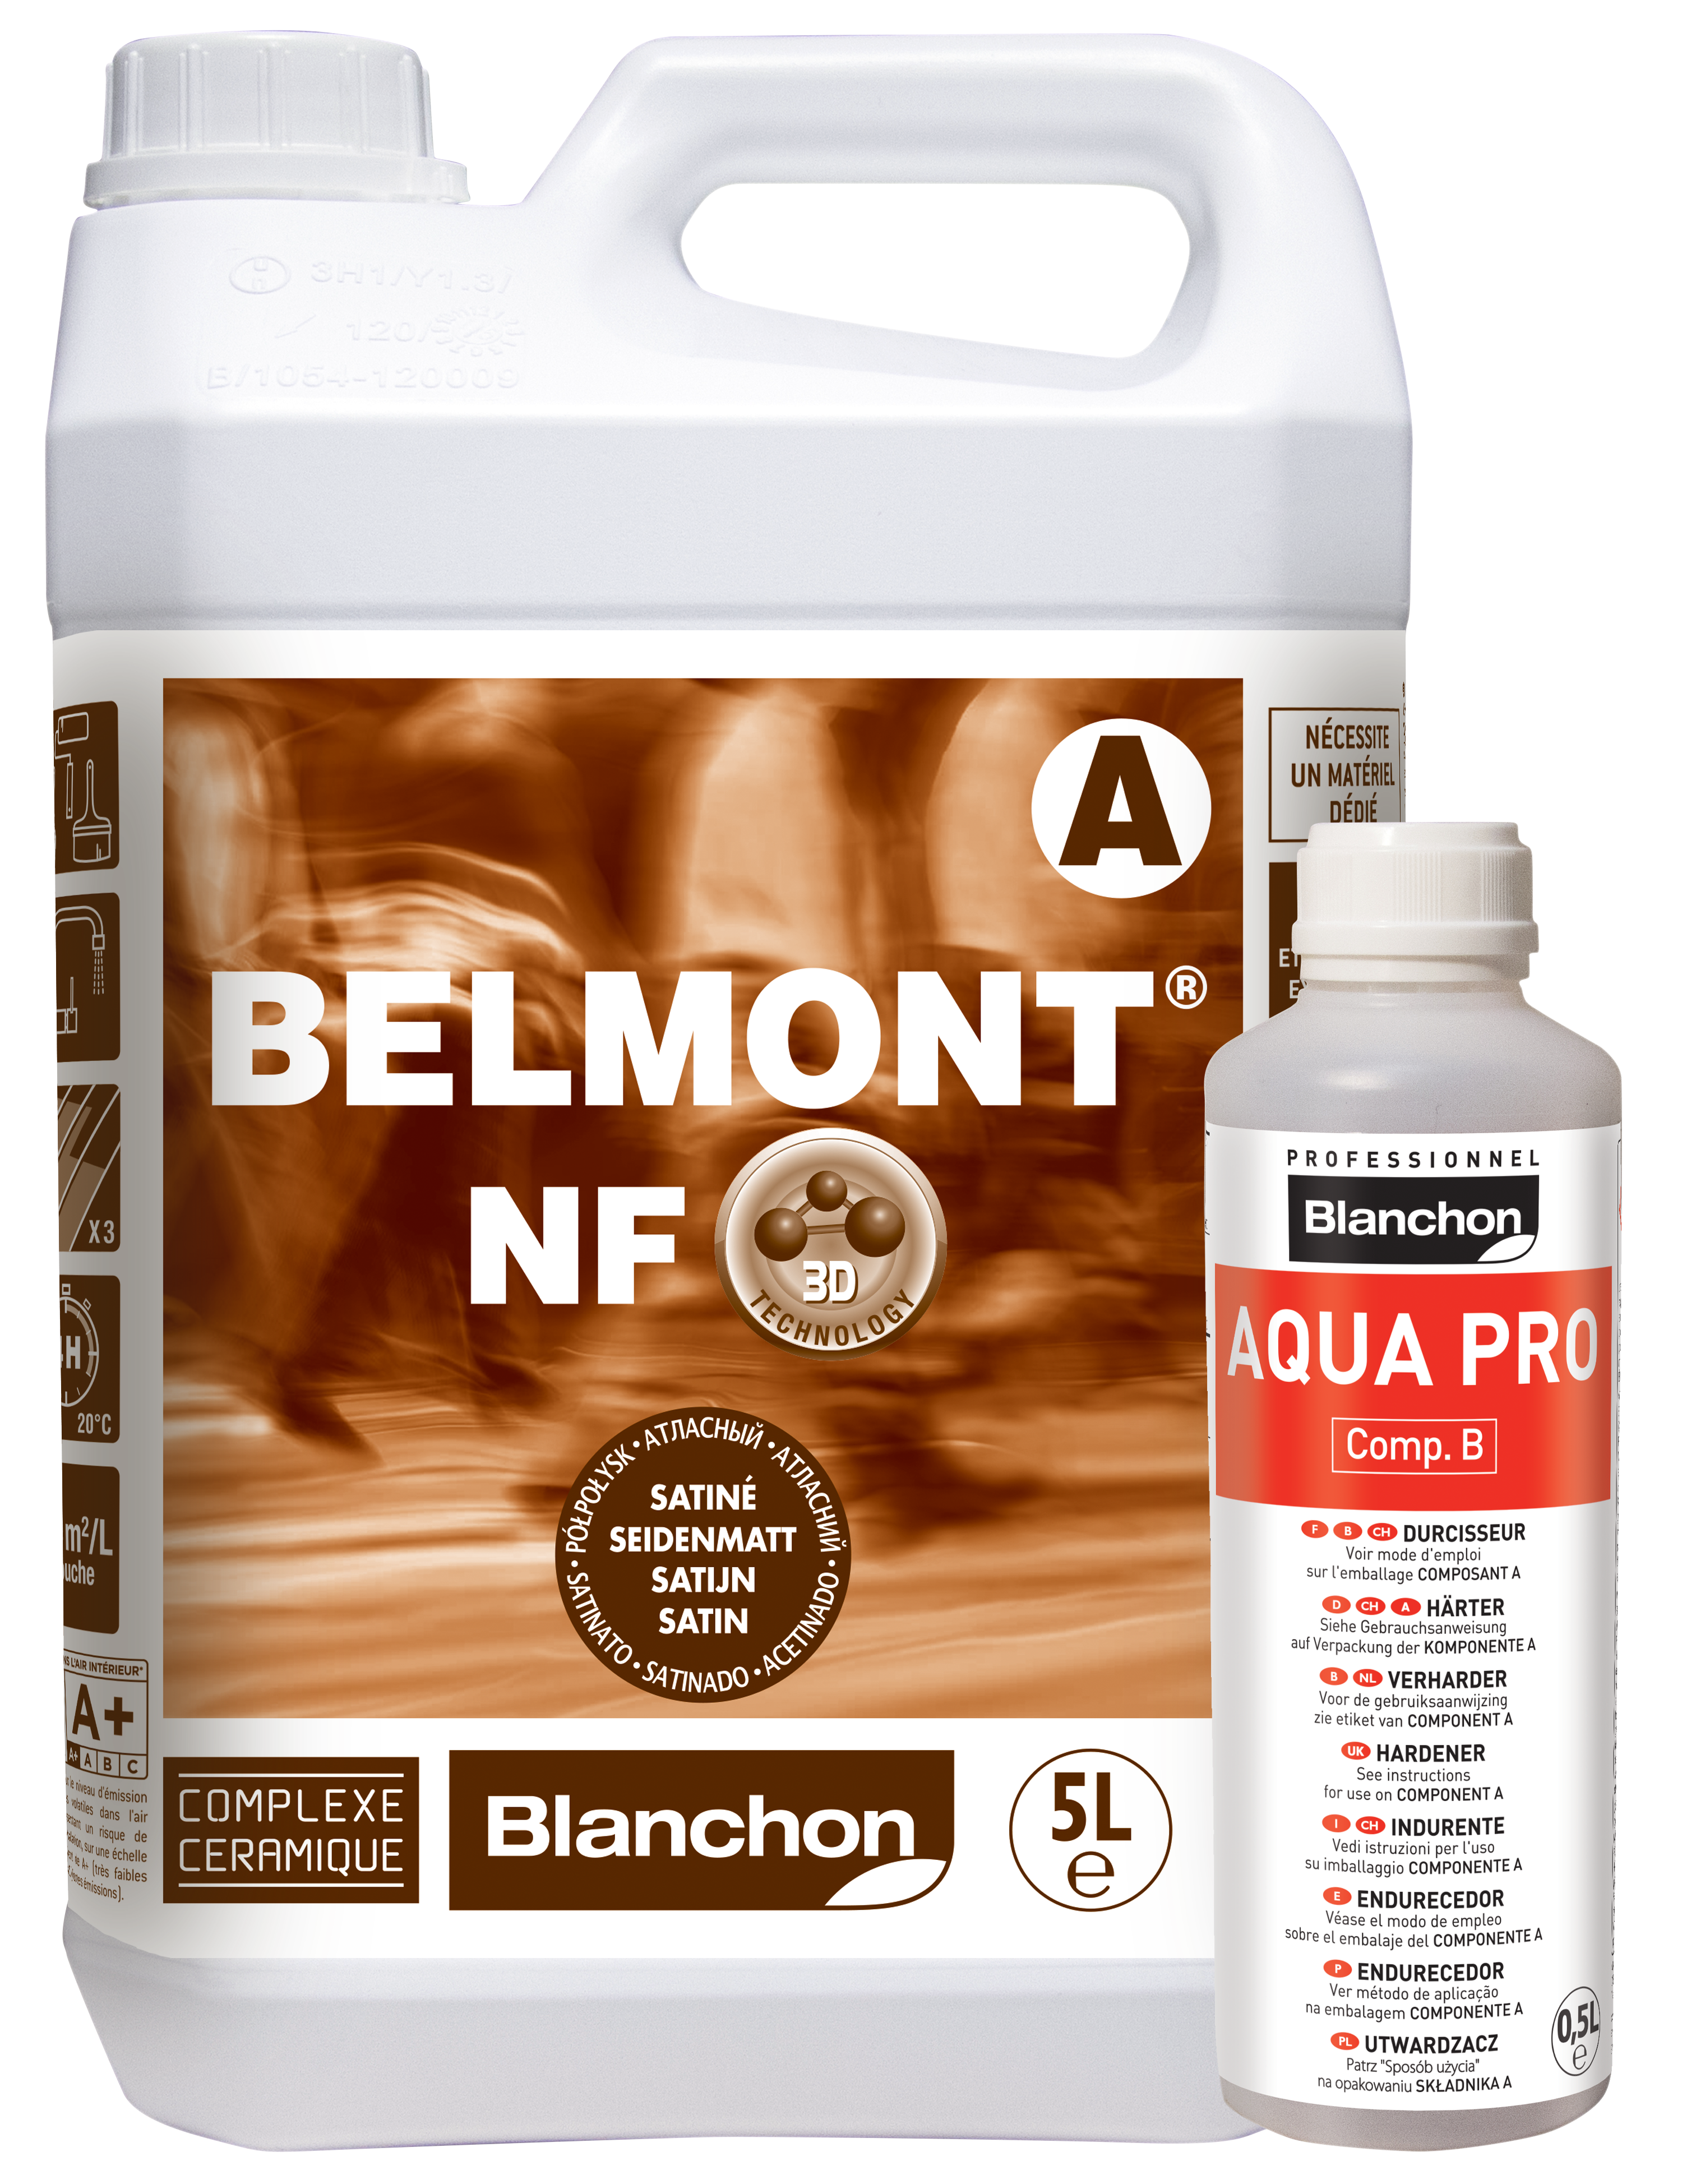 Belmont® NF